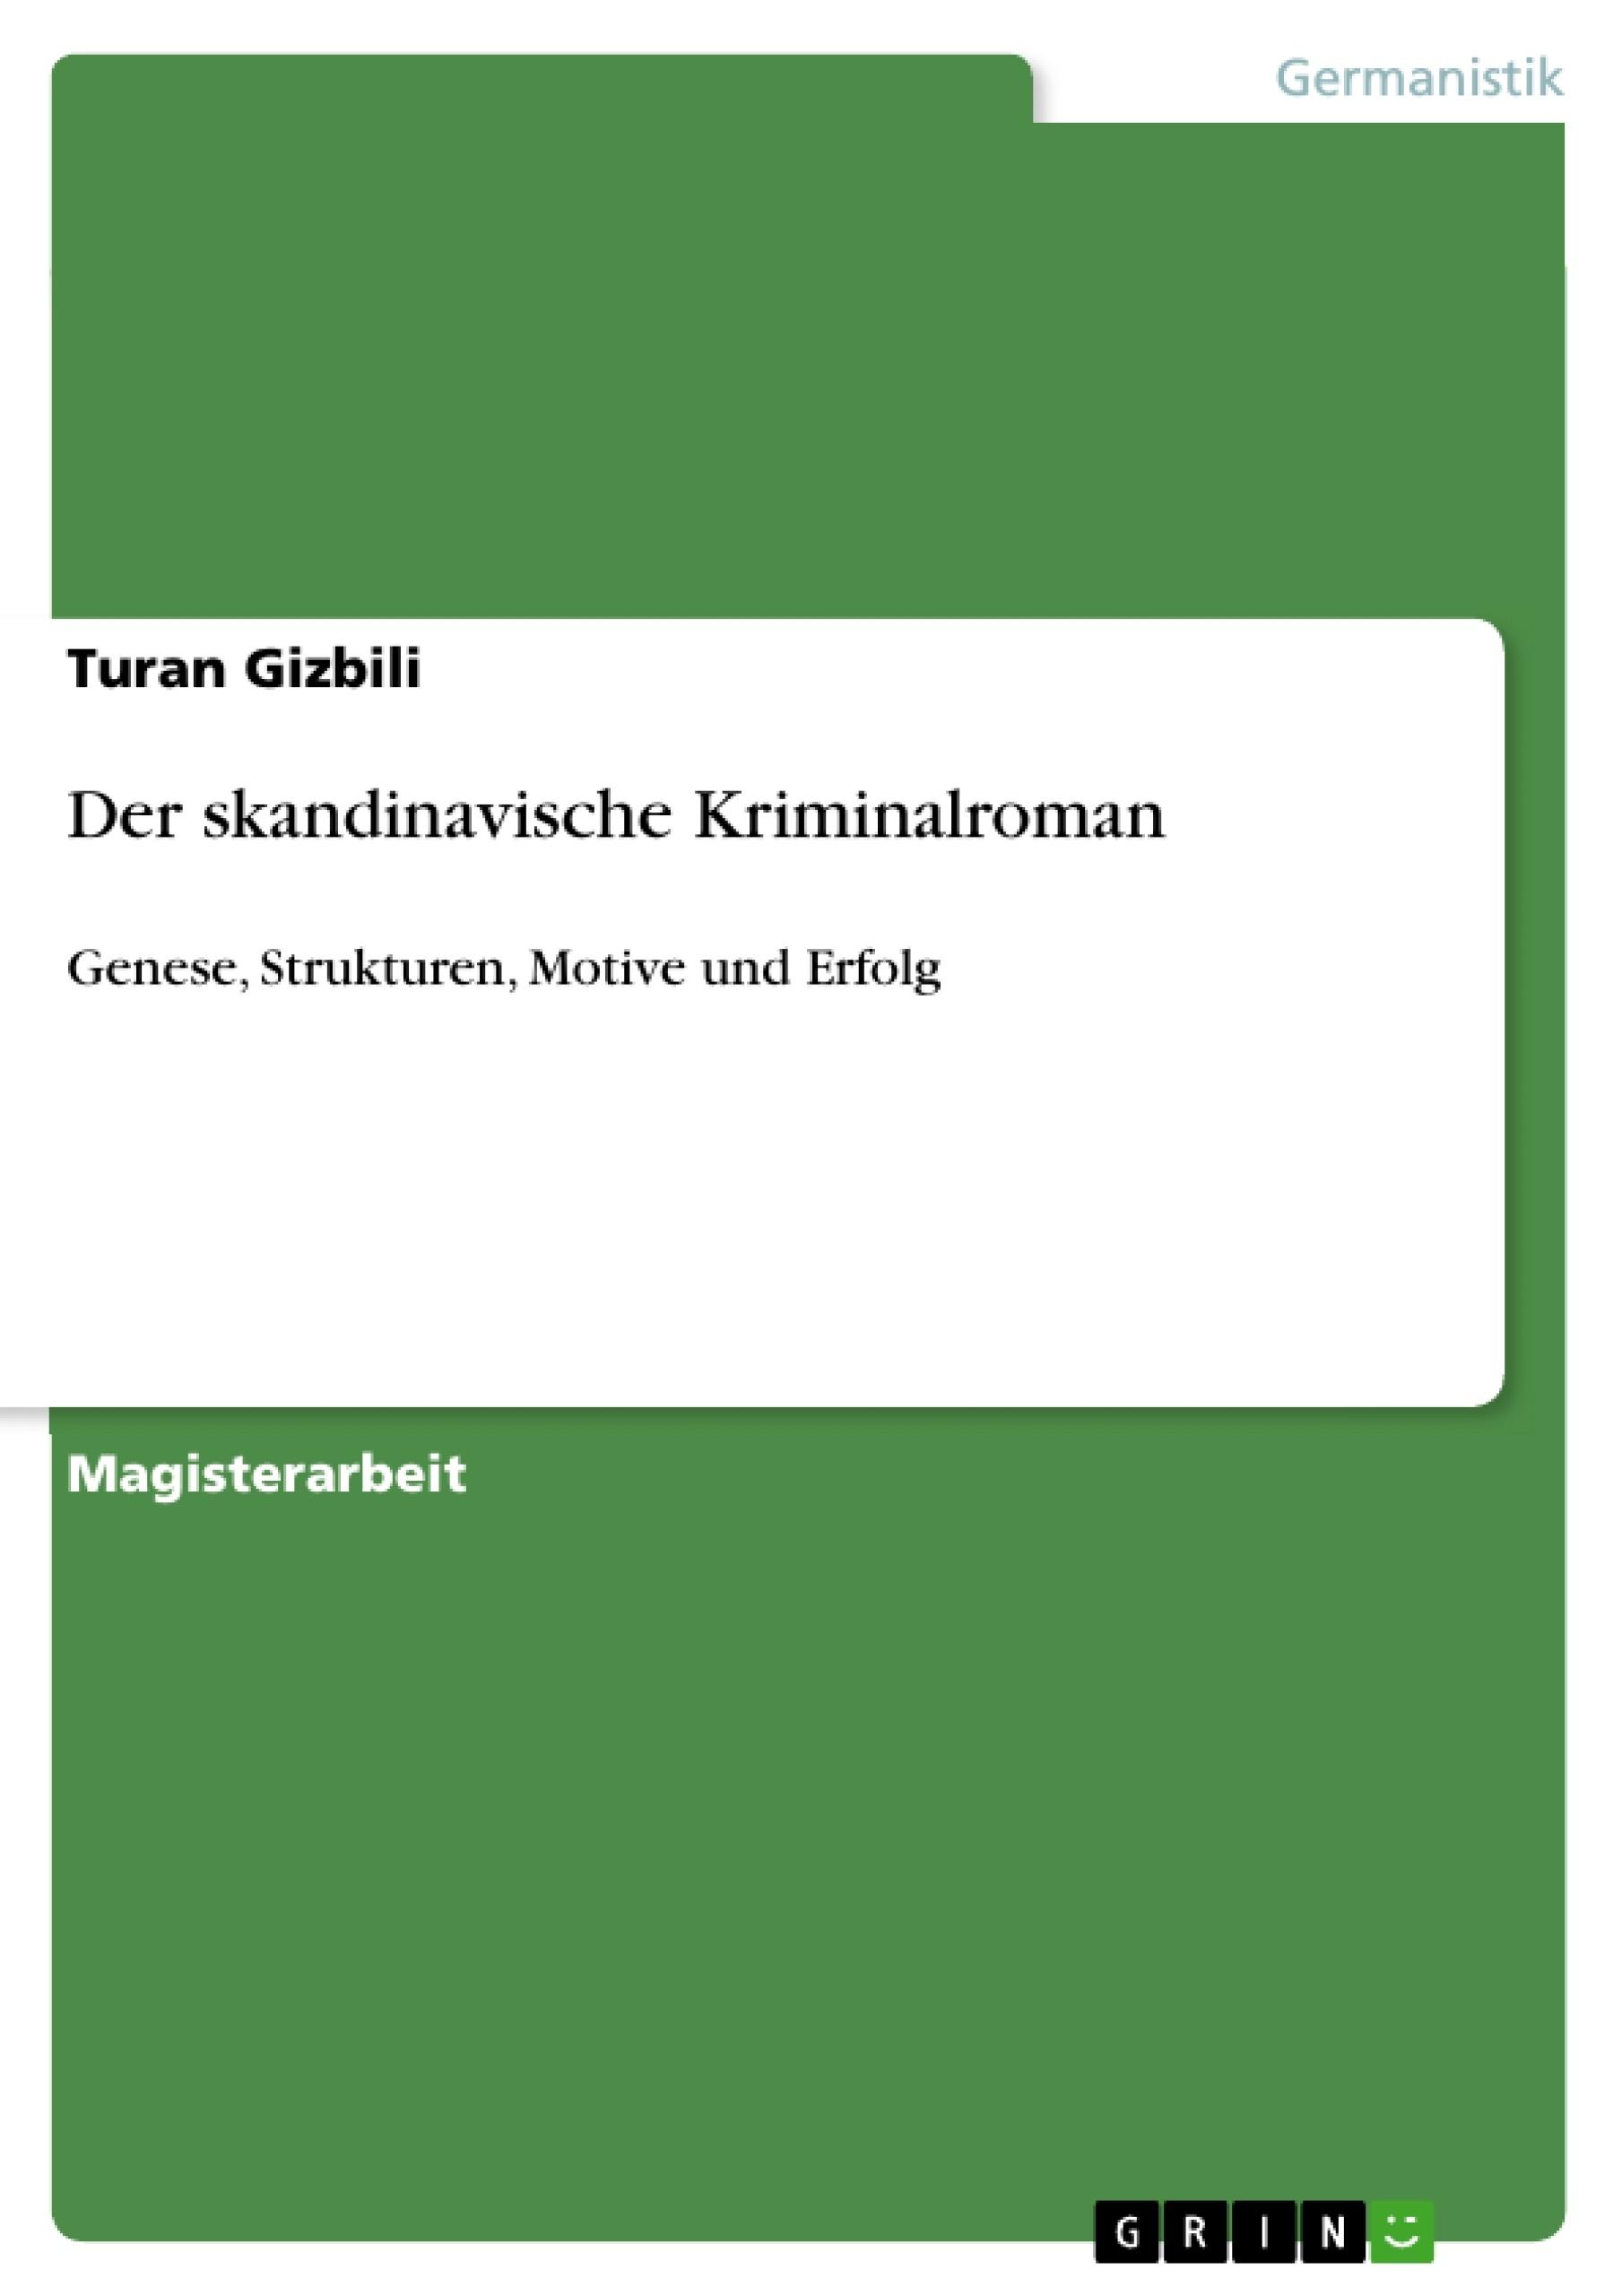 Titel: Der skandinavische Kriminalroman